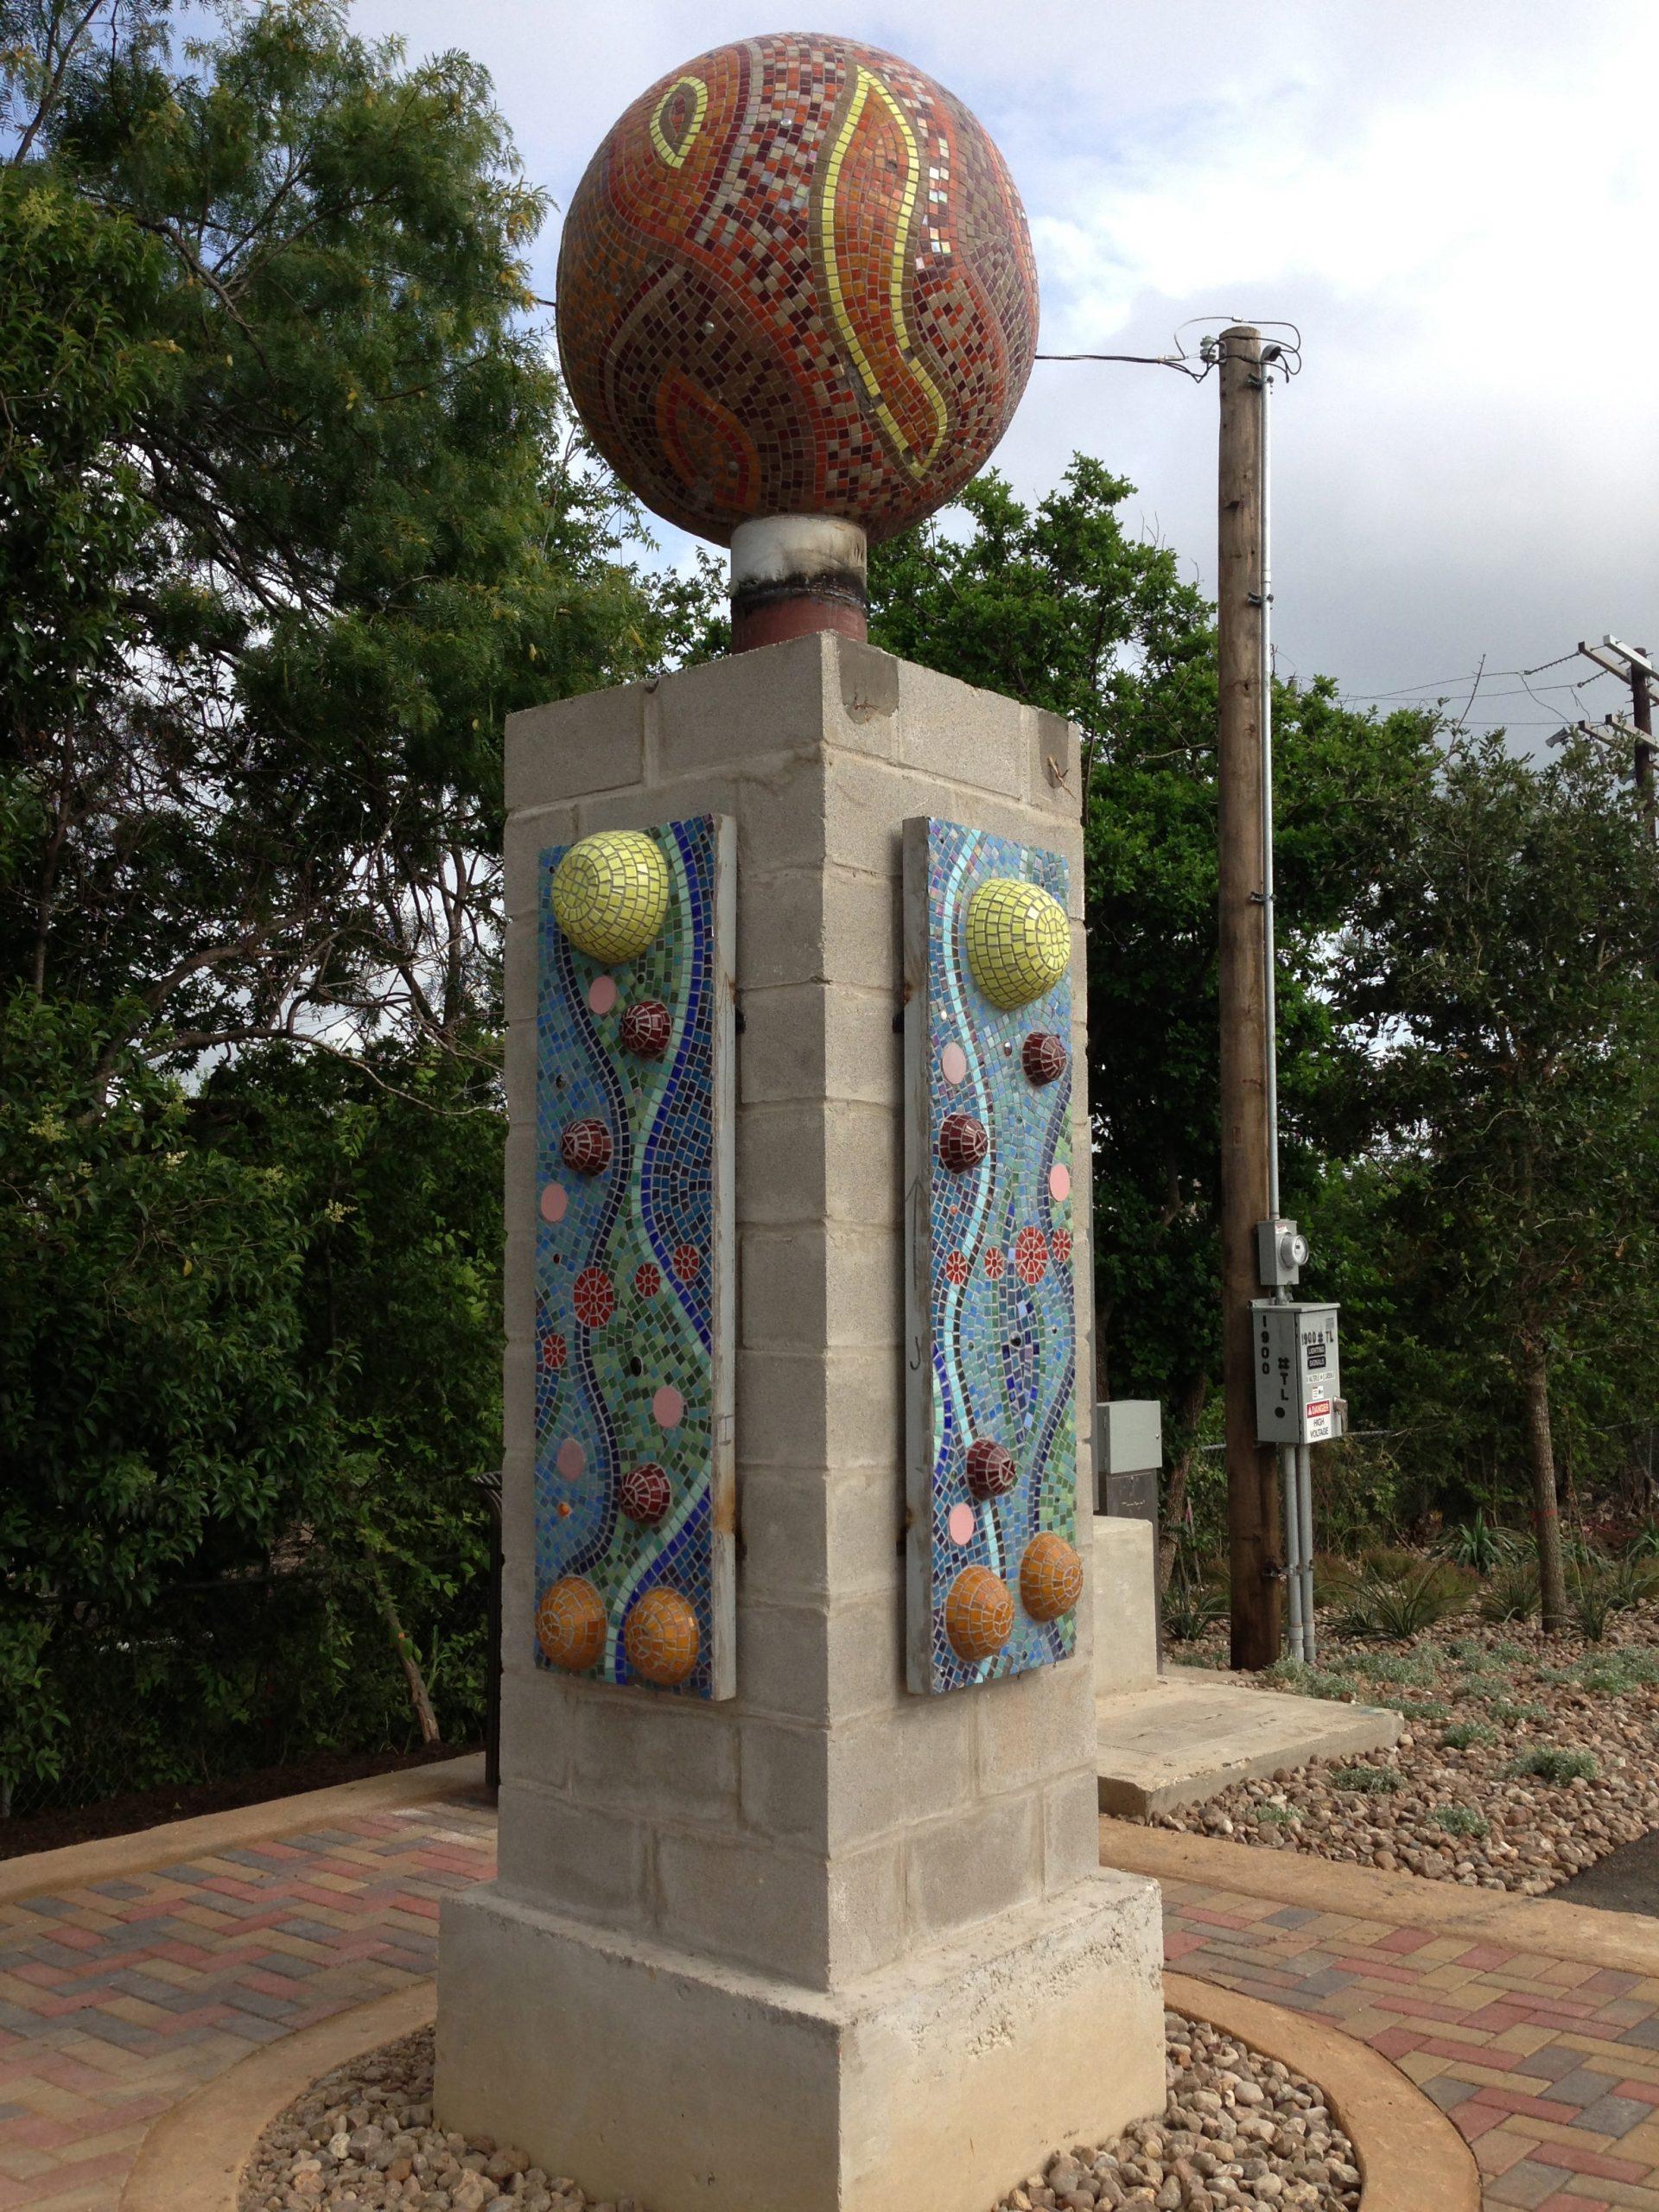 One of Oscar Alvarado's intricate columns that adorn Walters Street.